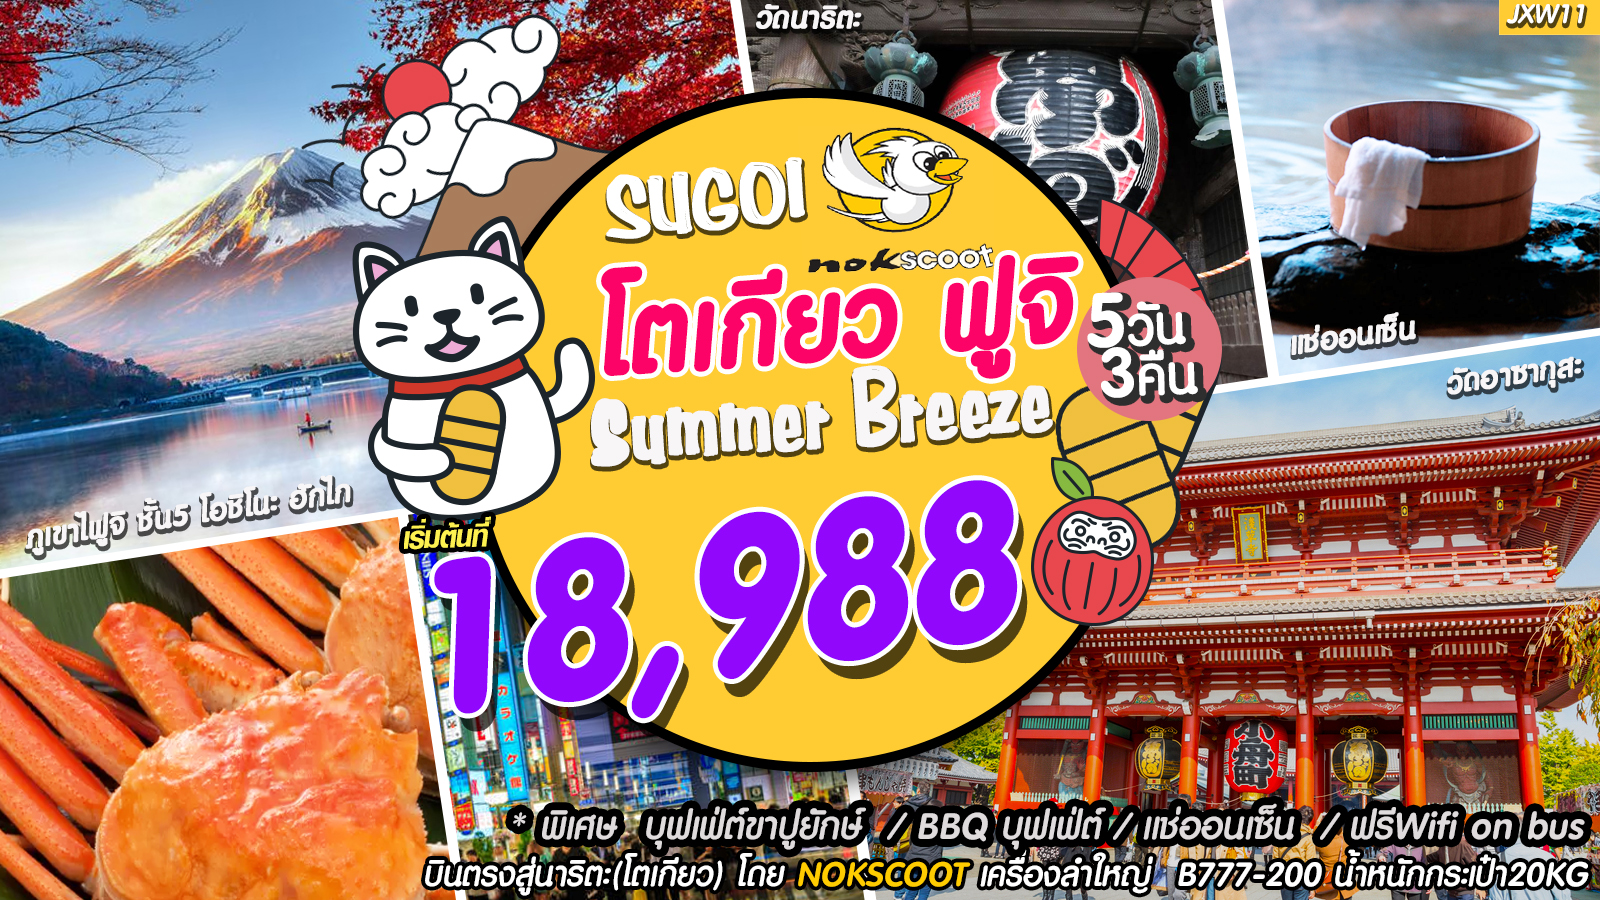 Sugoi โตเกียว ฟูจิ Summer Breeze 5วัน 3คืน มิ.ย.- ก.ย.61